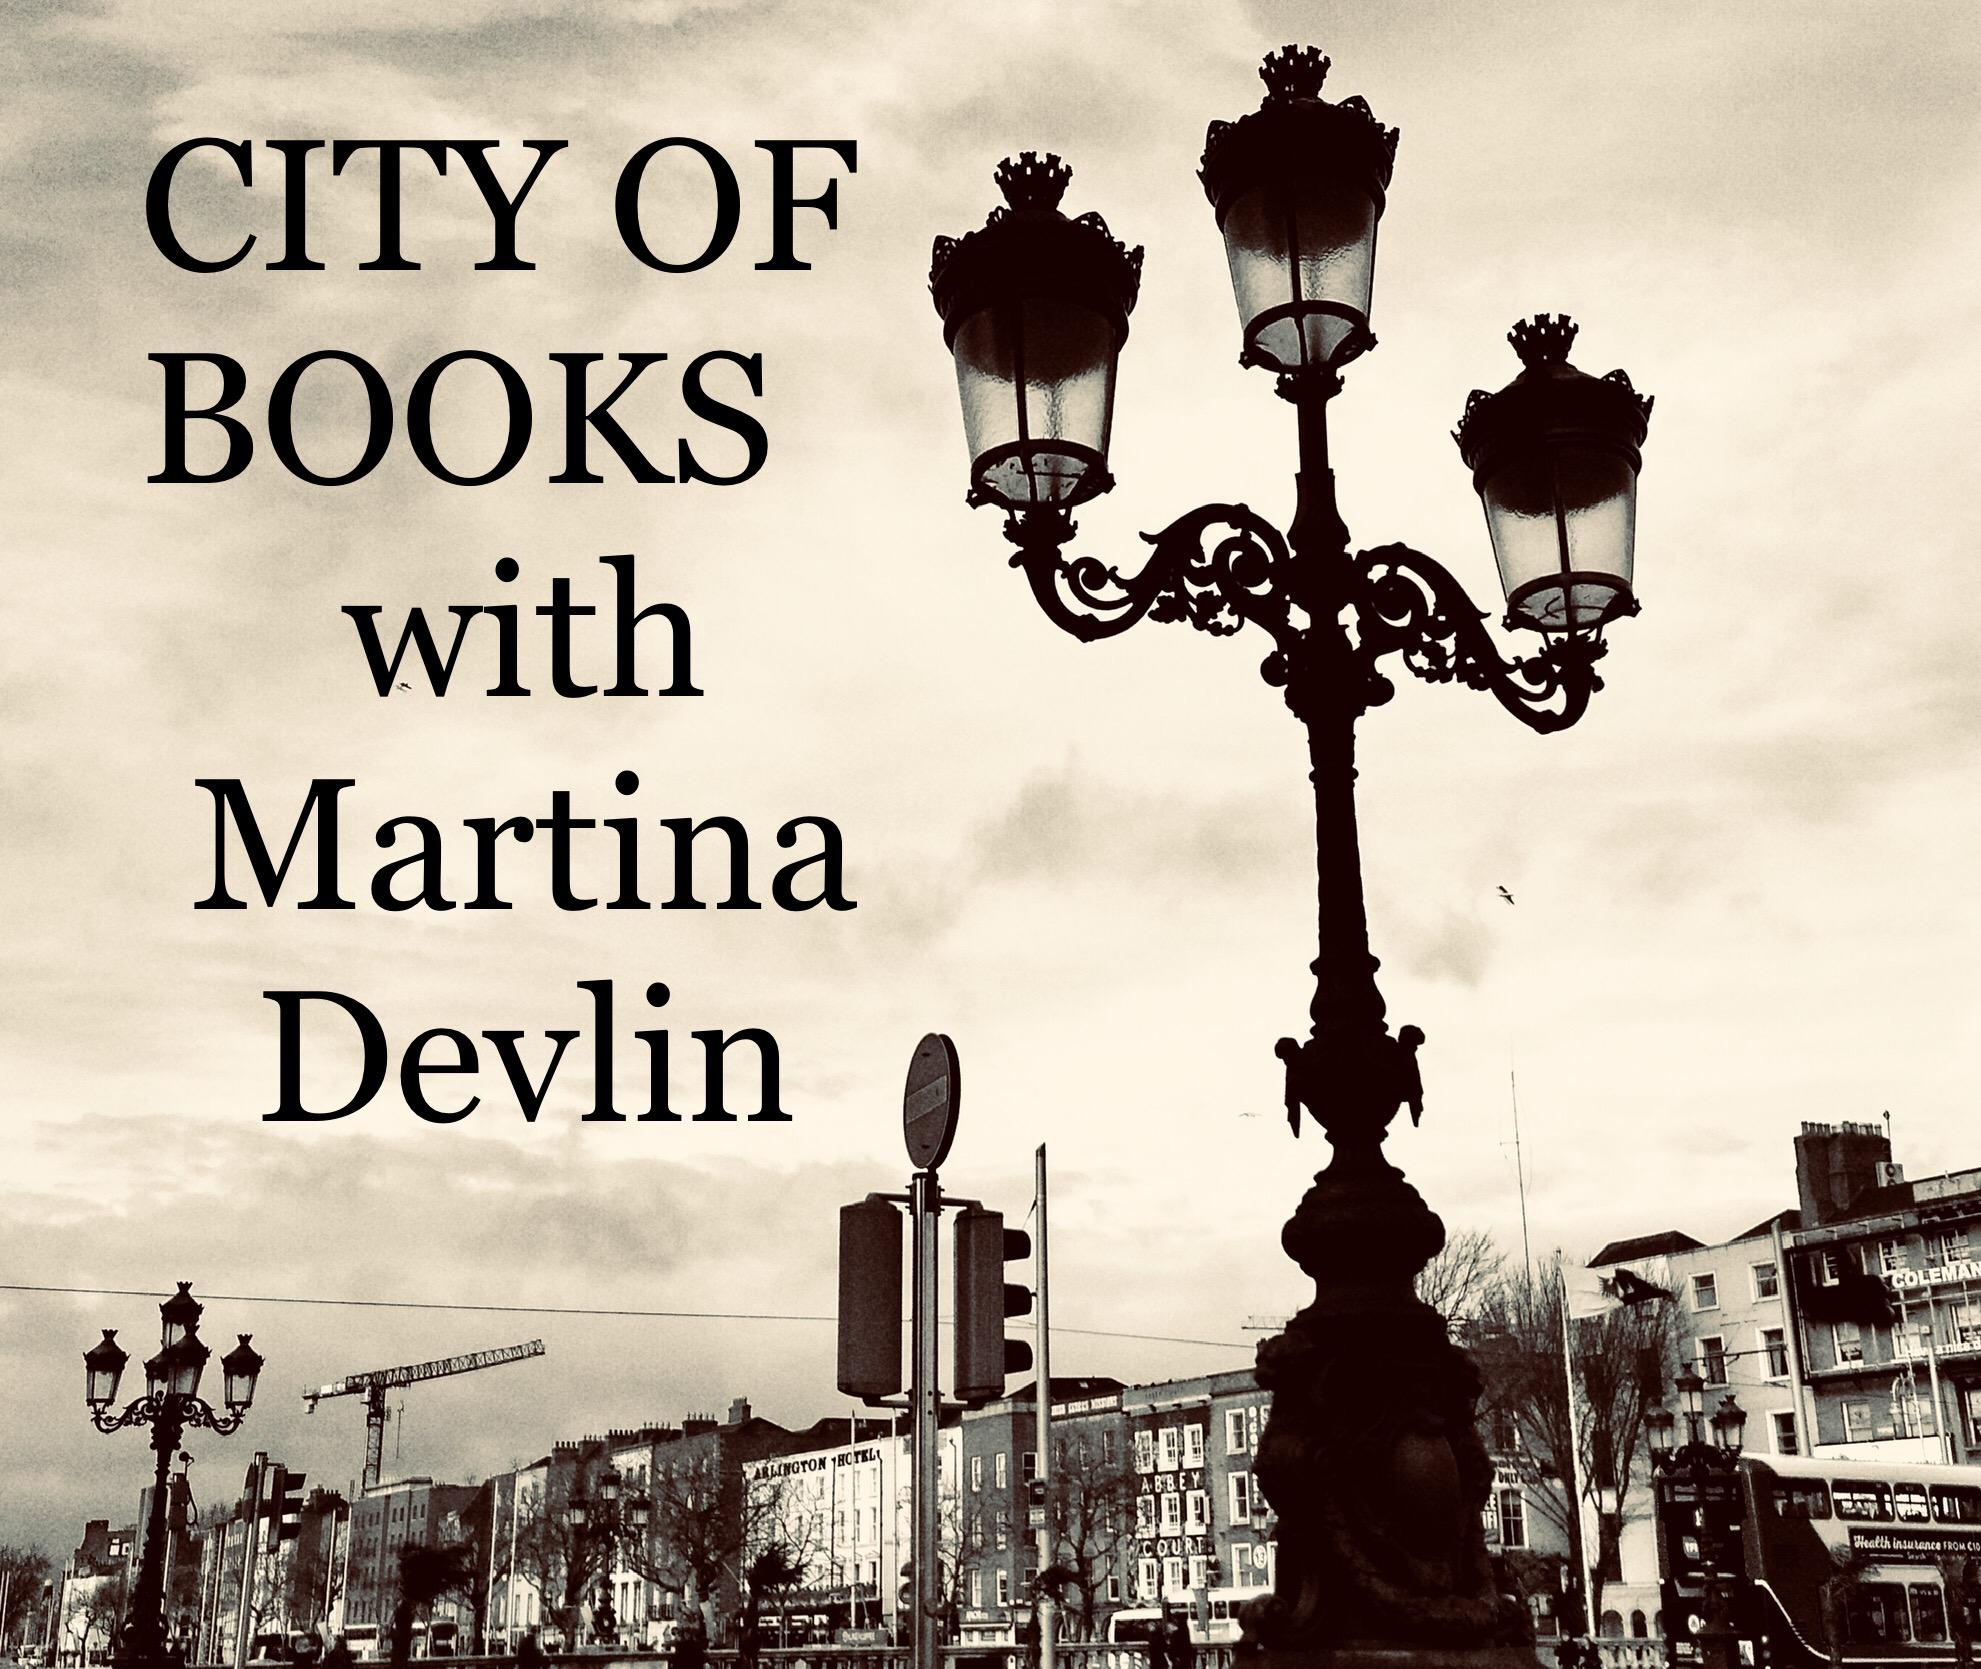 City of Books Trailer show art